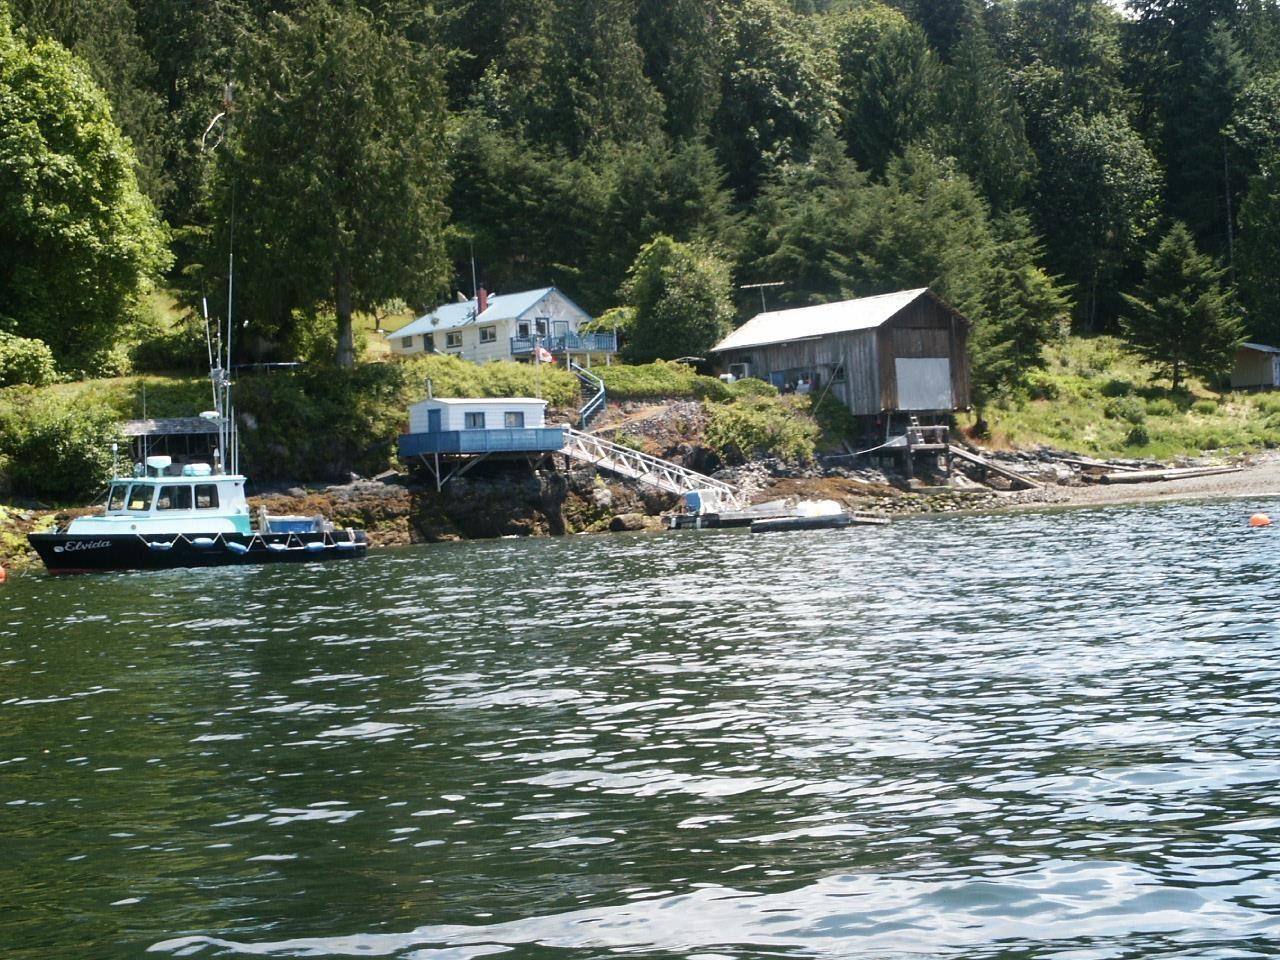 Main Photo: DL 6222 MCNUTT Bay in Pender Harbour: Pender Harbour Egmont House for sale (Sunshine Coast)  : MLS®# R2595150